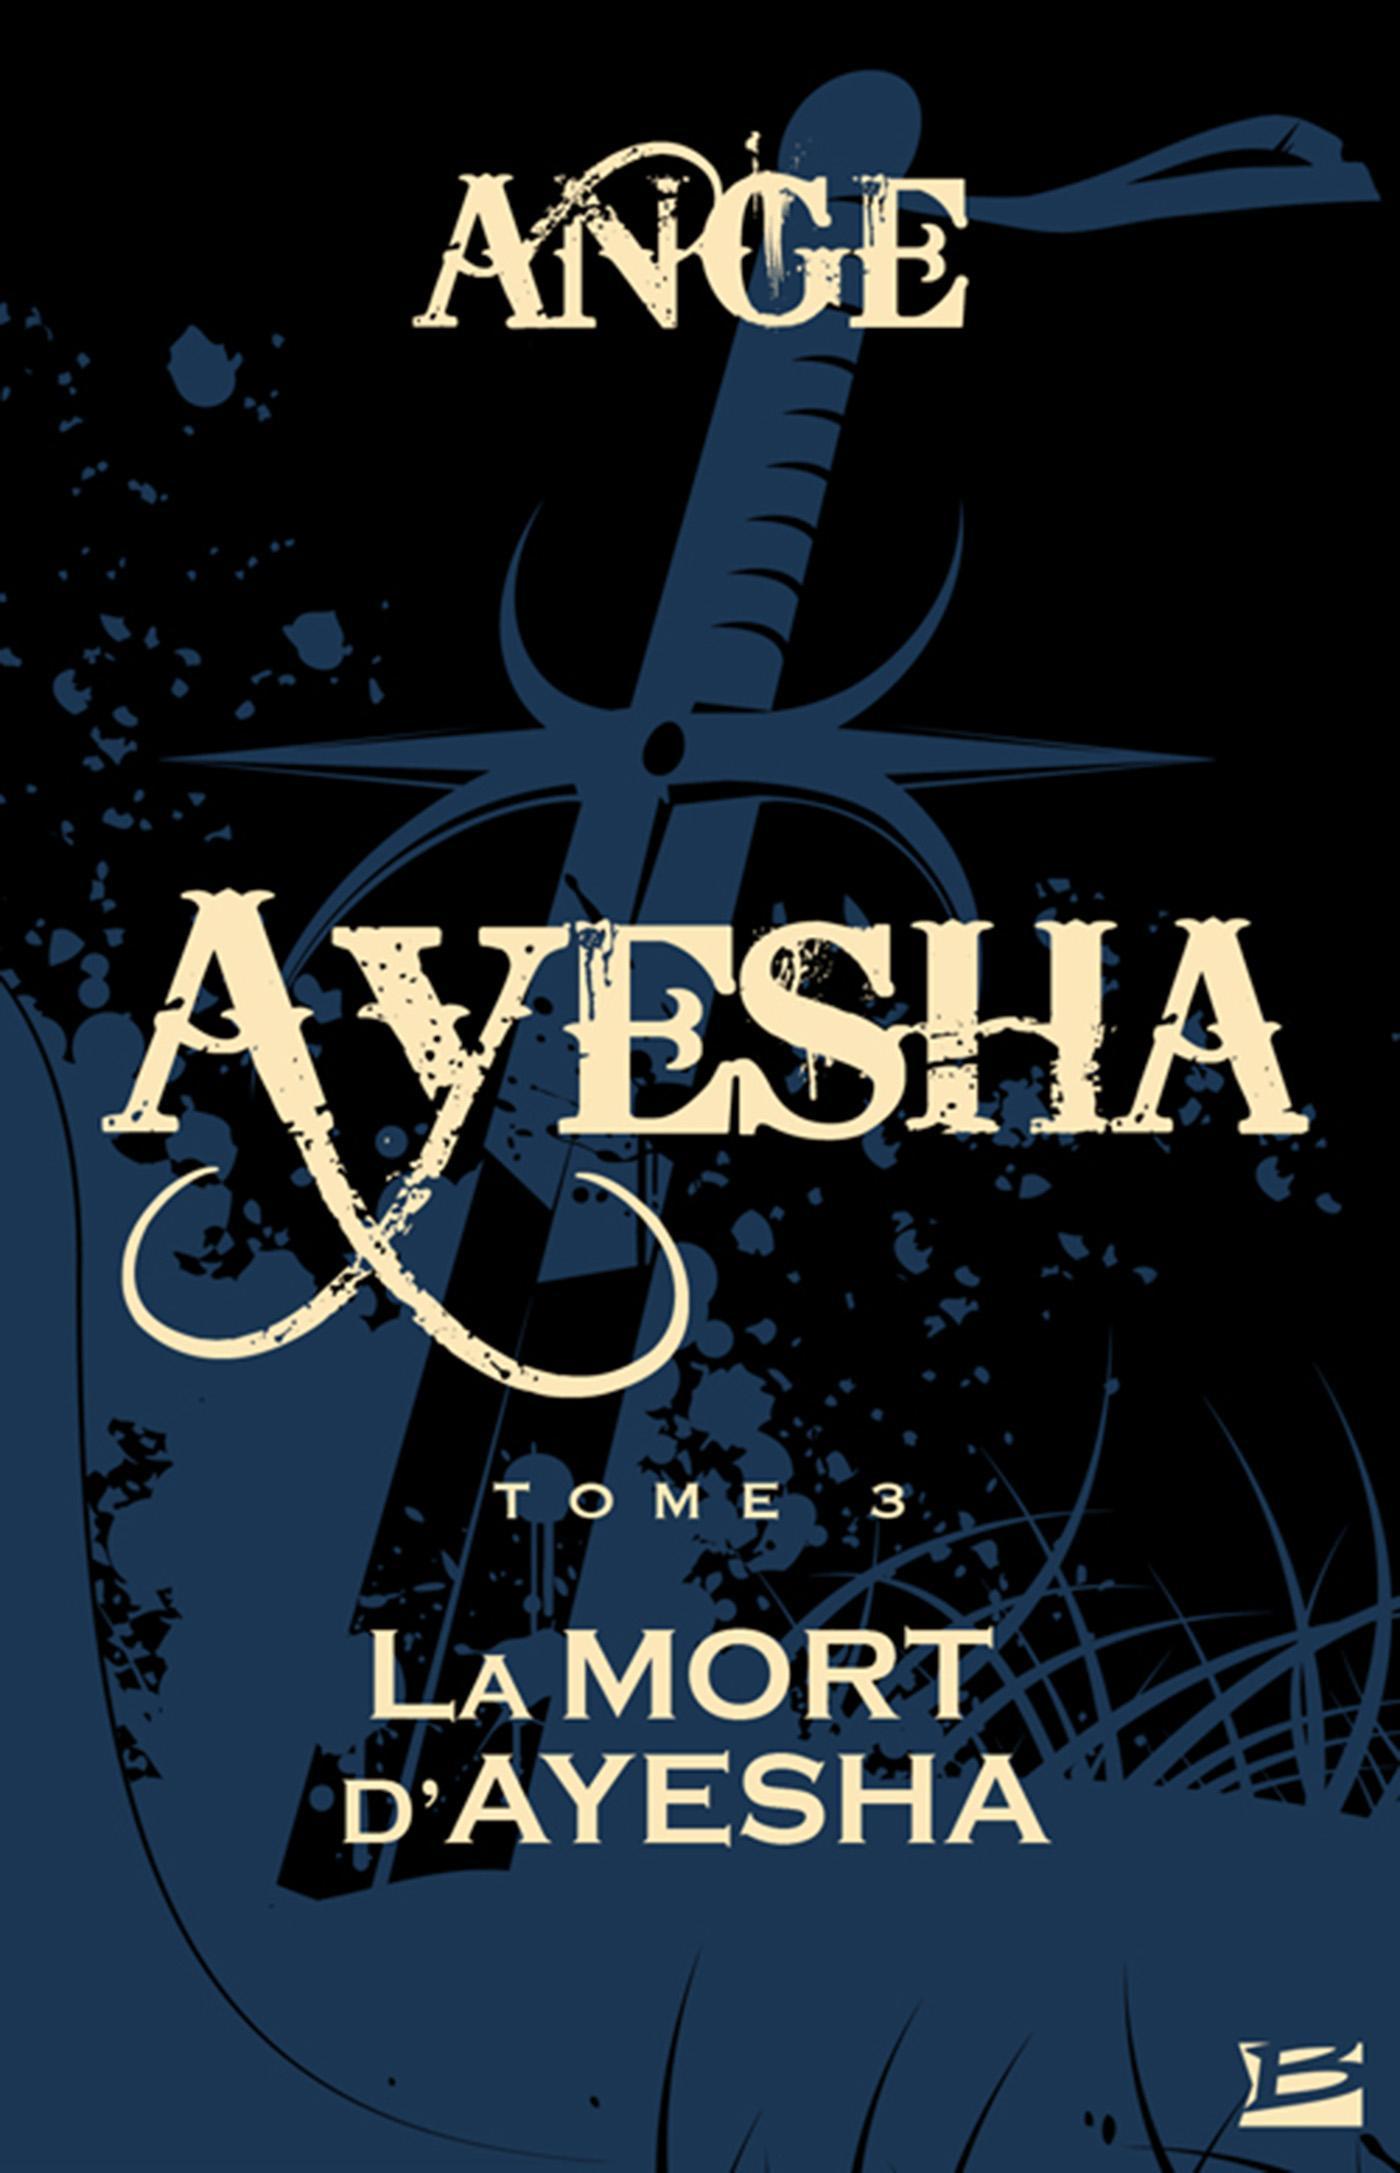 La Mort d'Ayesha, AYESHA, T3